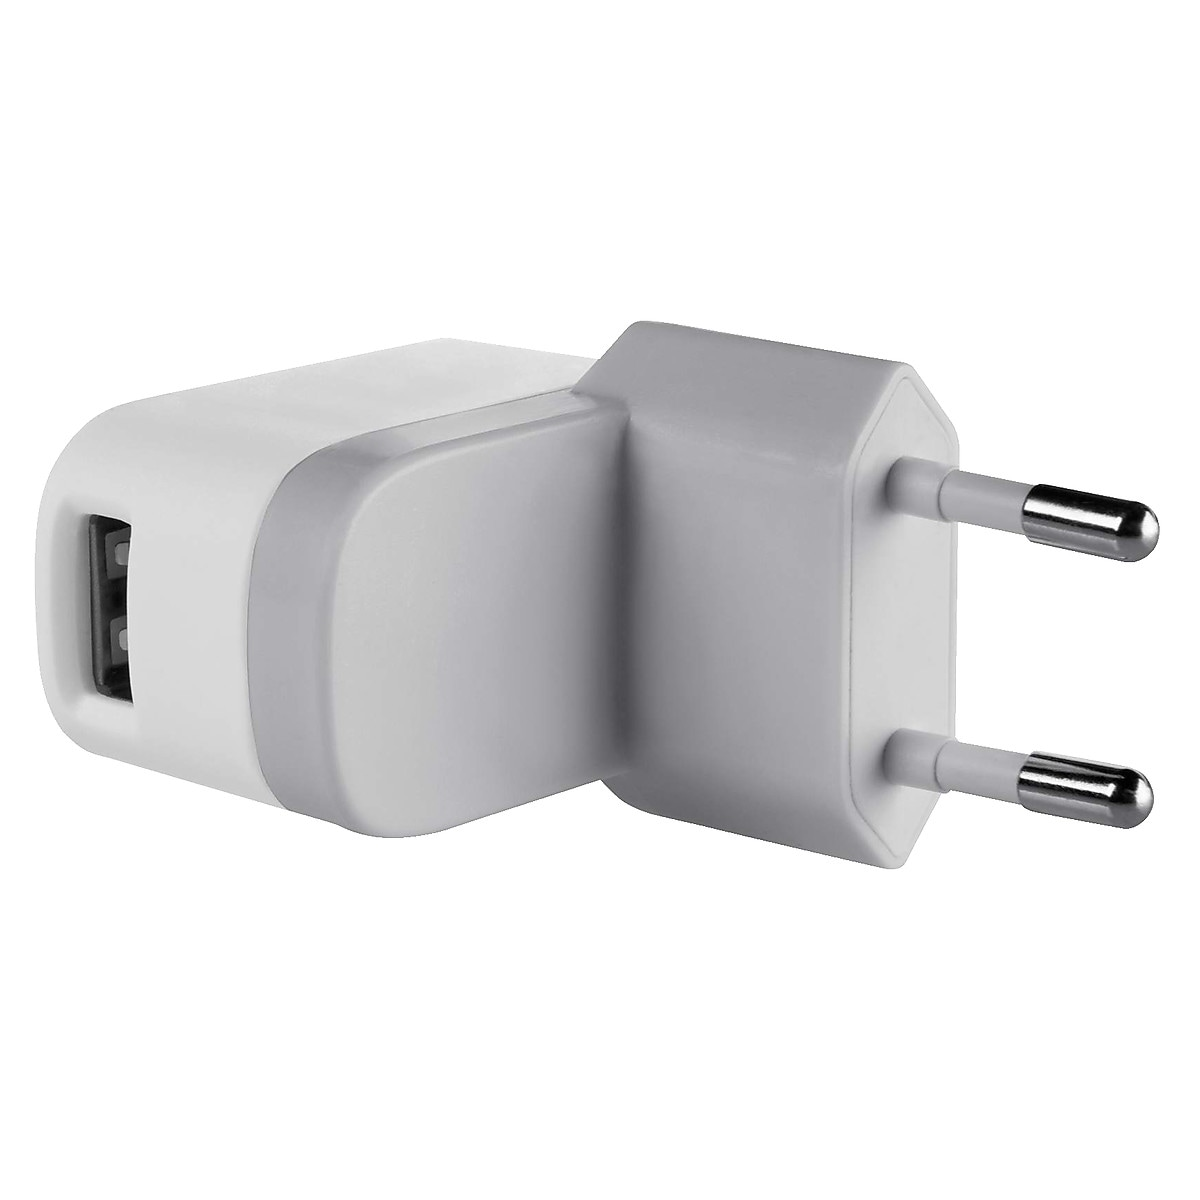 Universal USB-laddare, Belkin